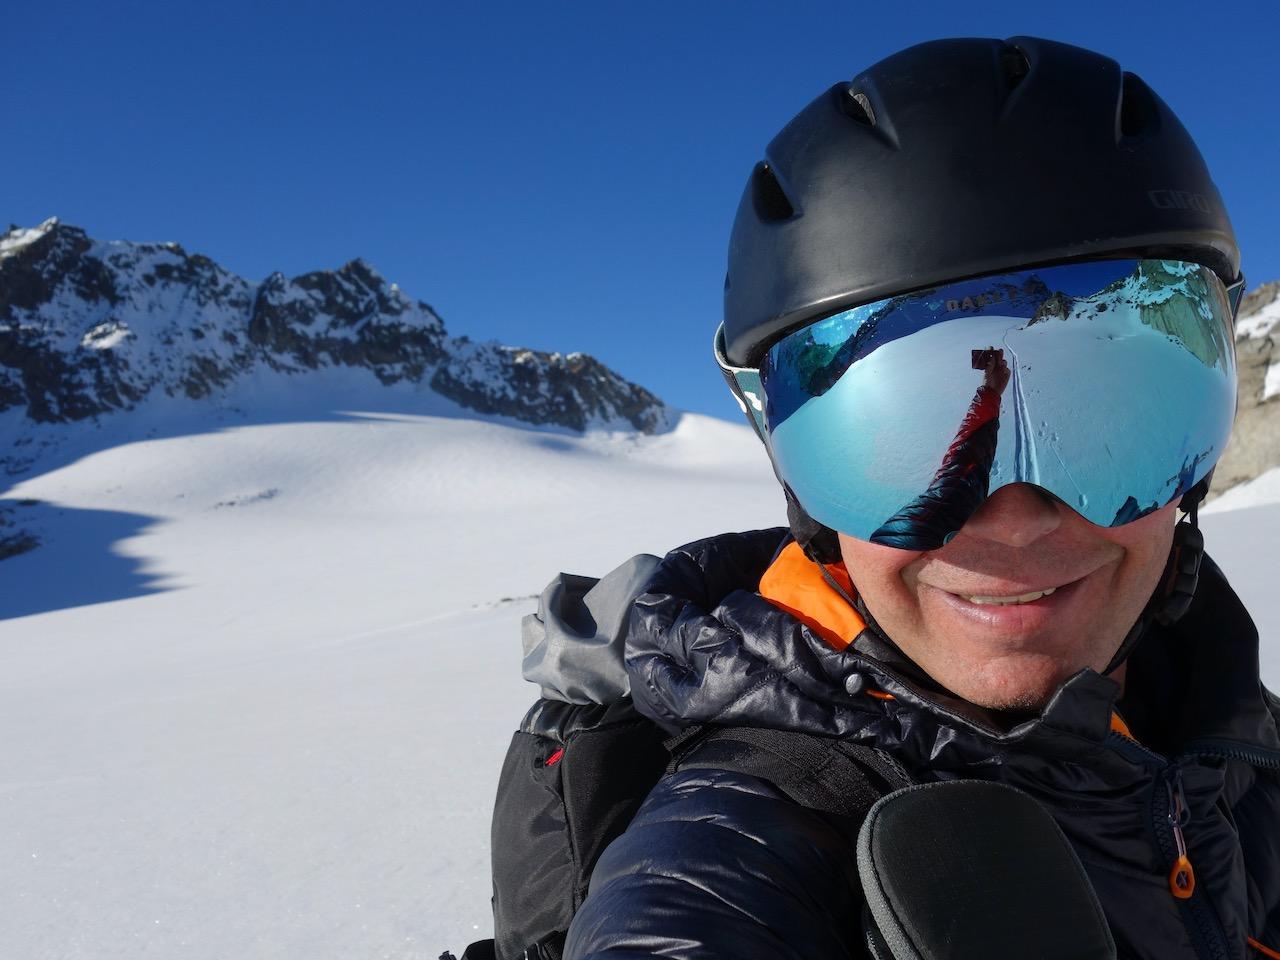 Rückblick Silvrettapass, Davos Klosters